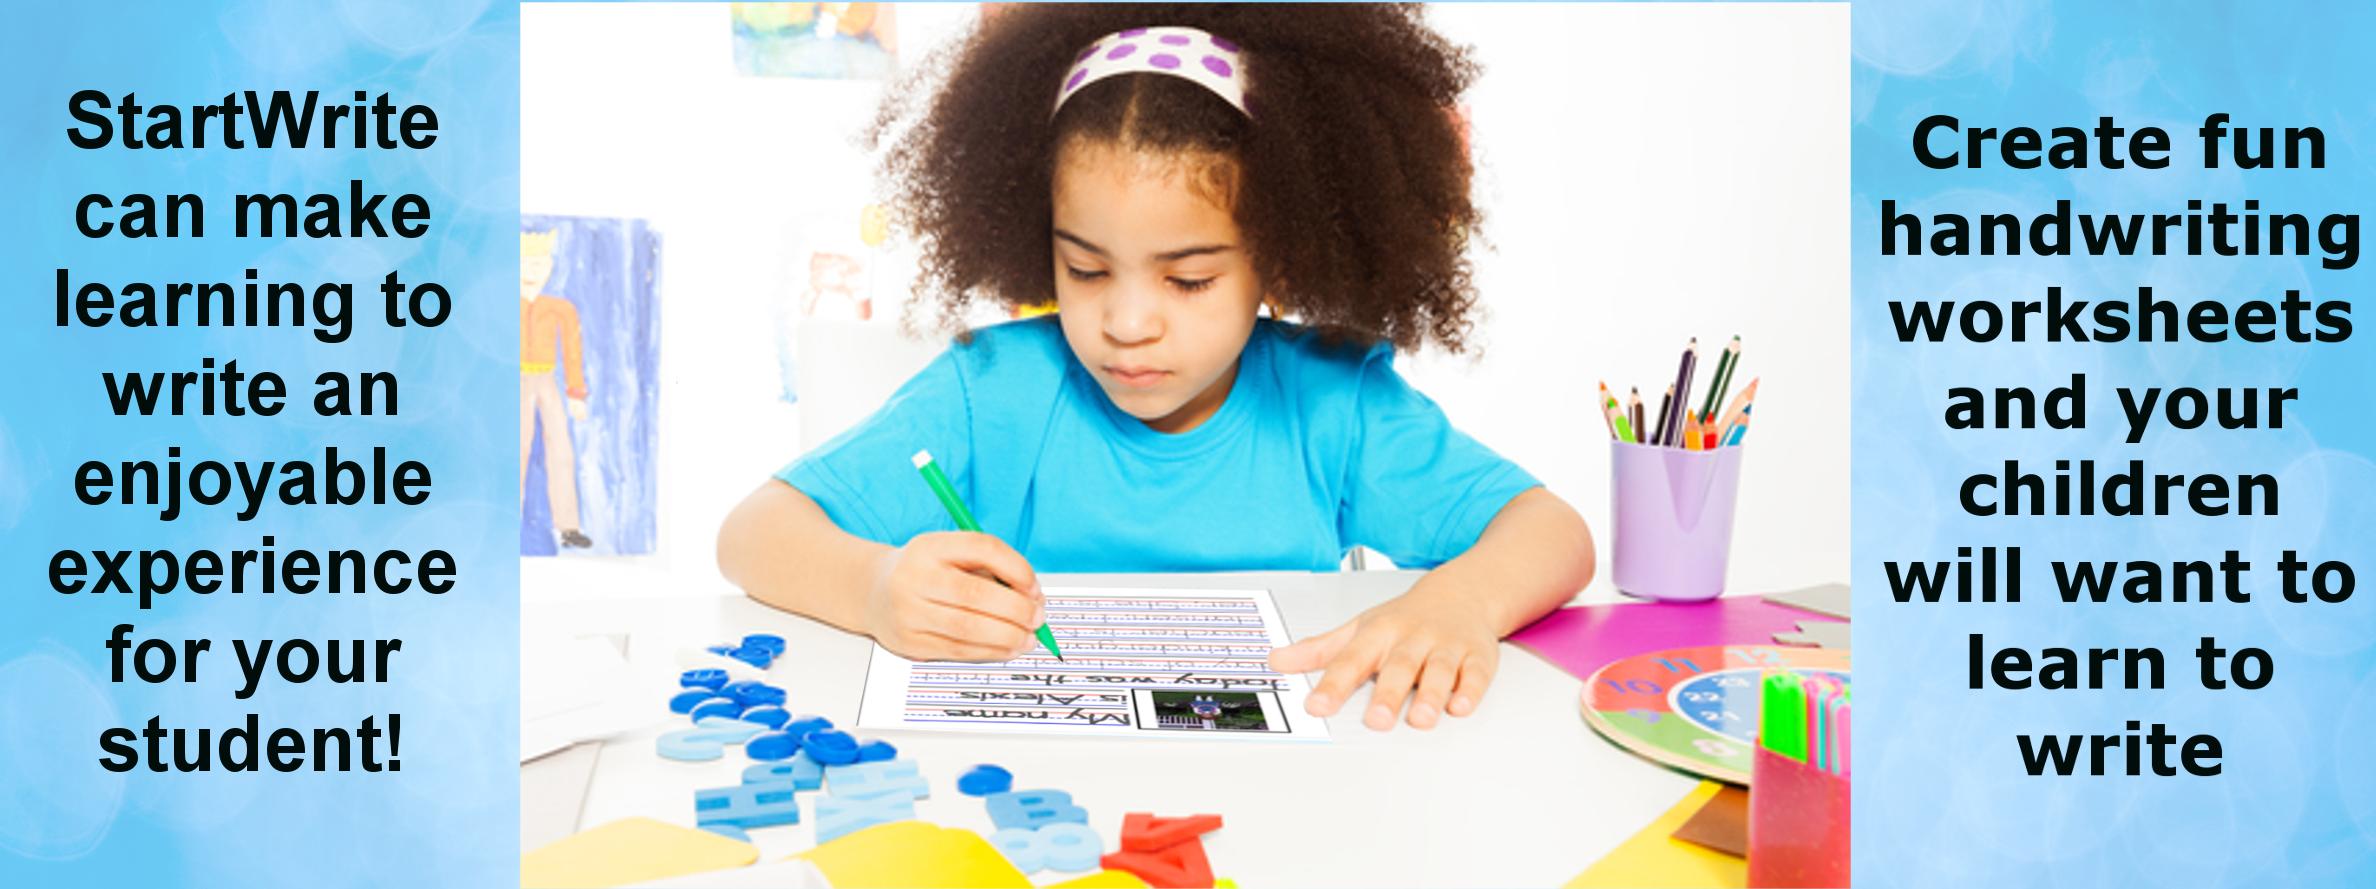 Free Handwriting Worksheets